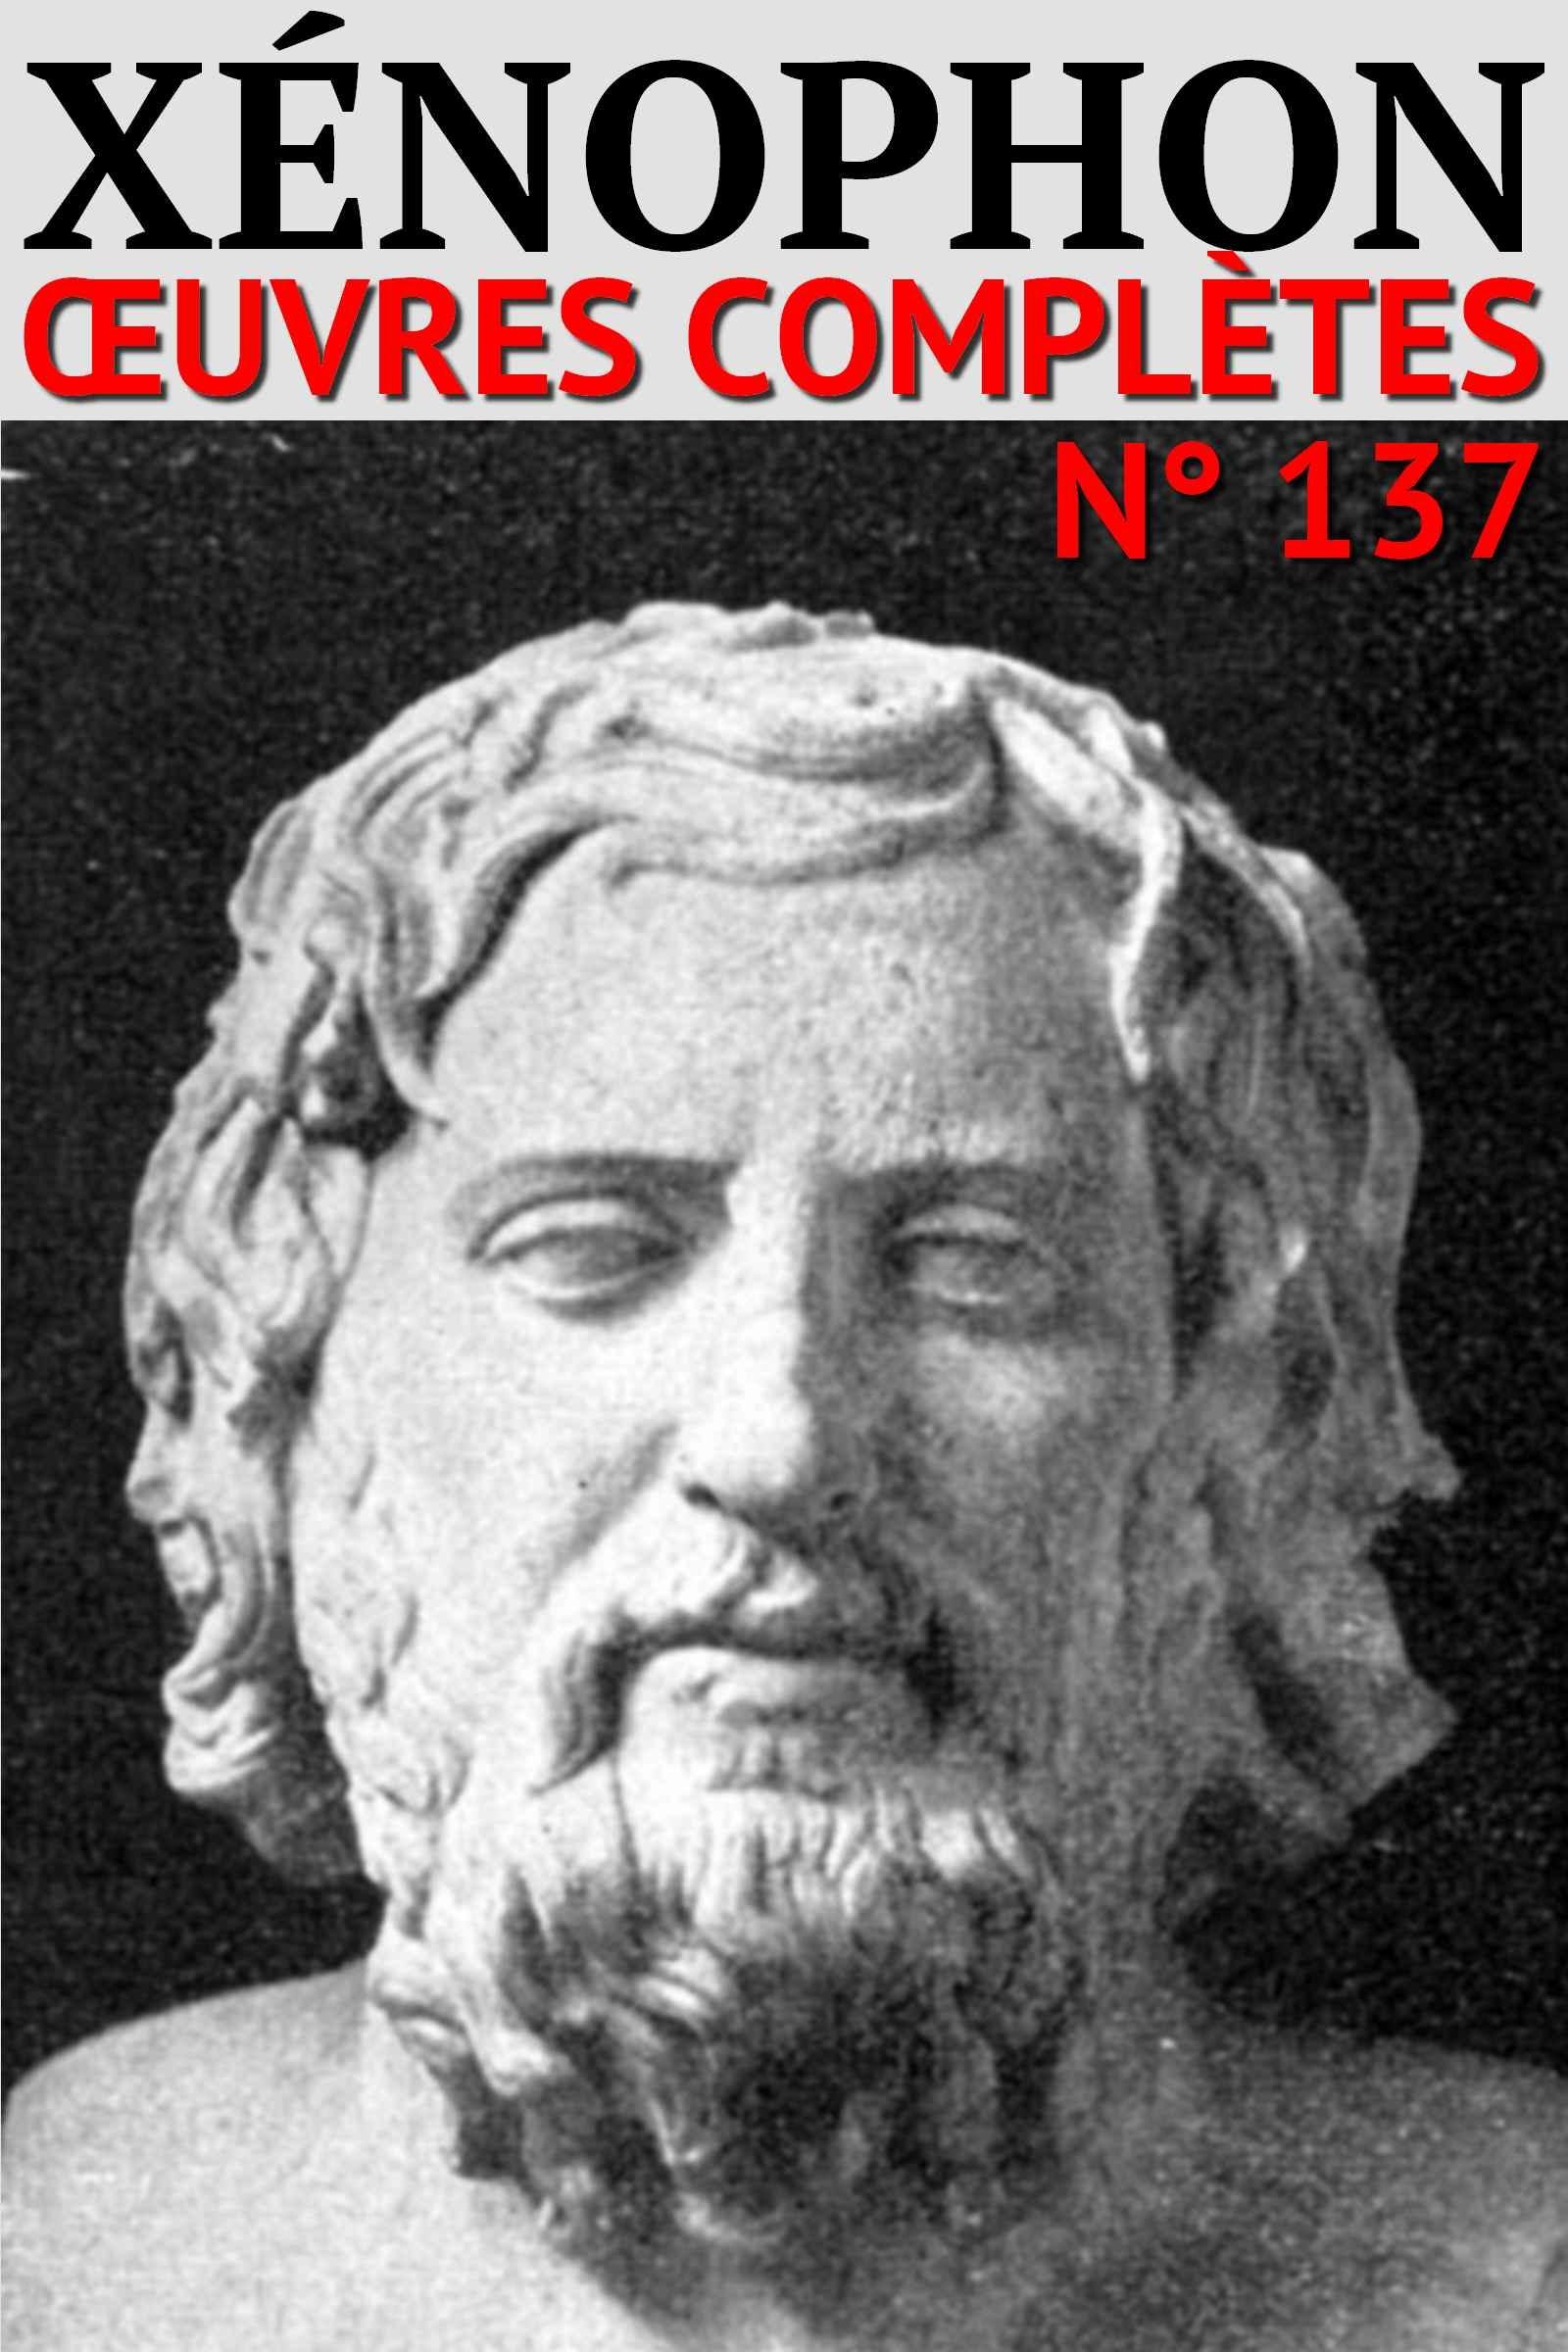 Xénophon - Oeuvres Complètes (137)